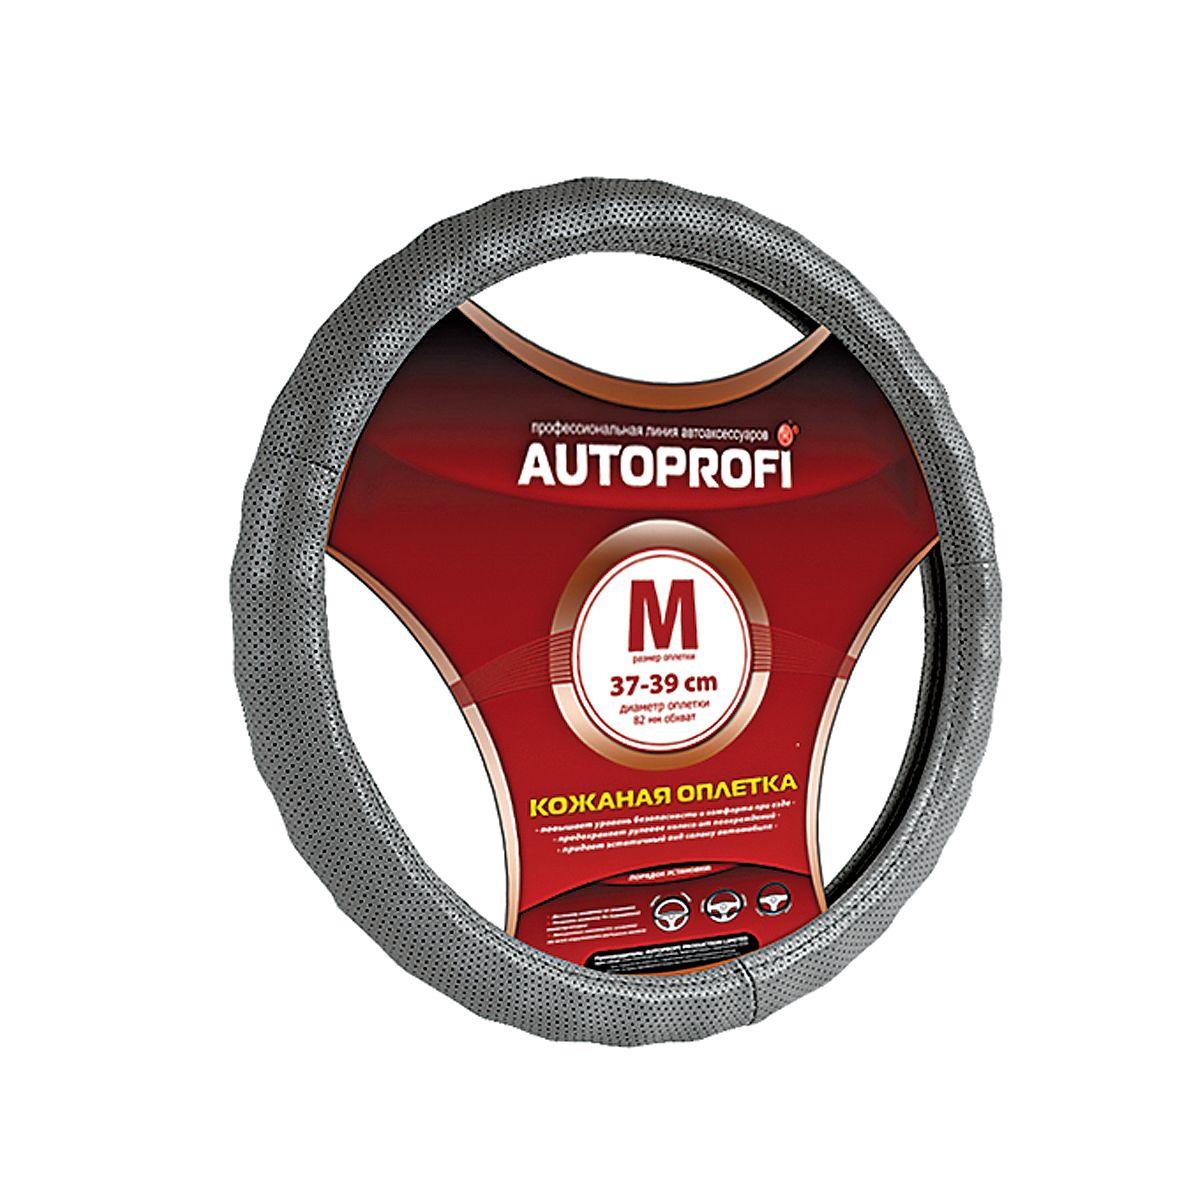 Оплетка Autoprofi Ap-396 d.gy (m) оплетка autoprofi ap 396 d gy m